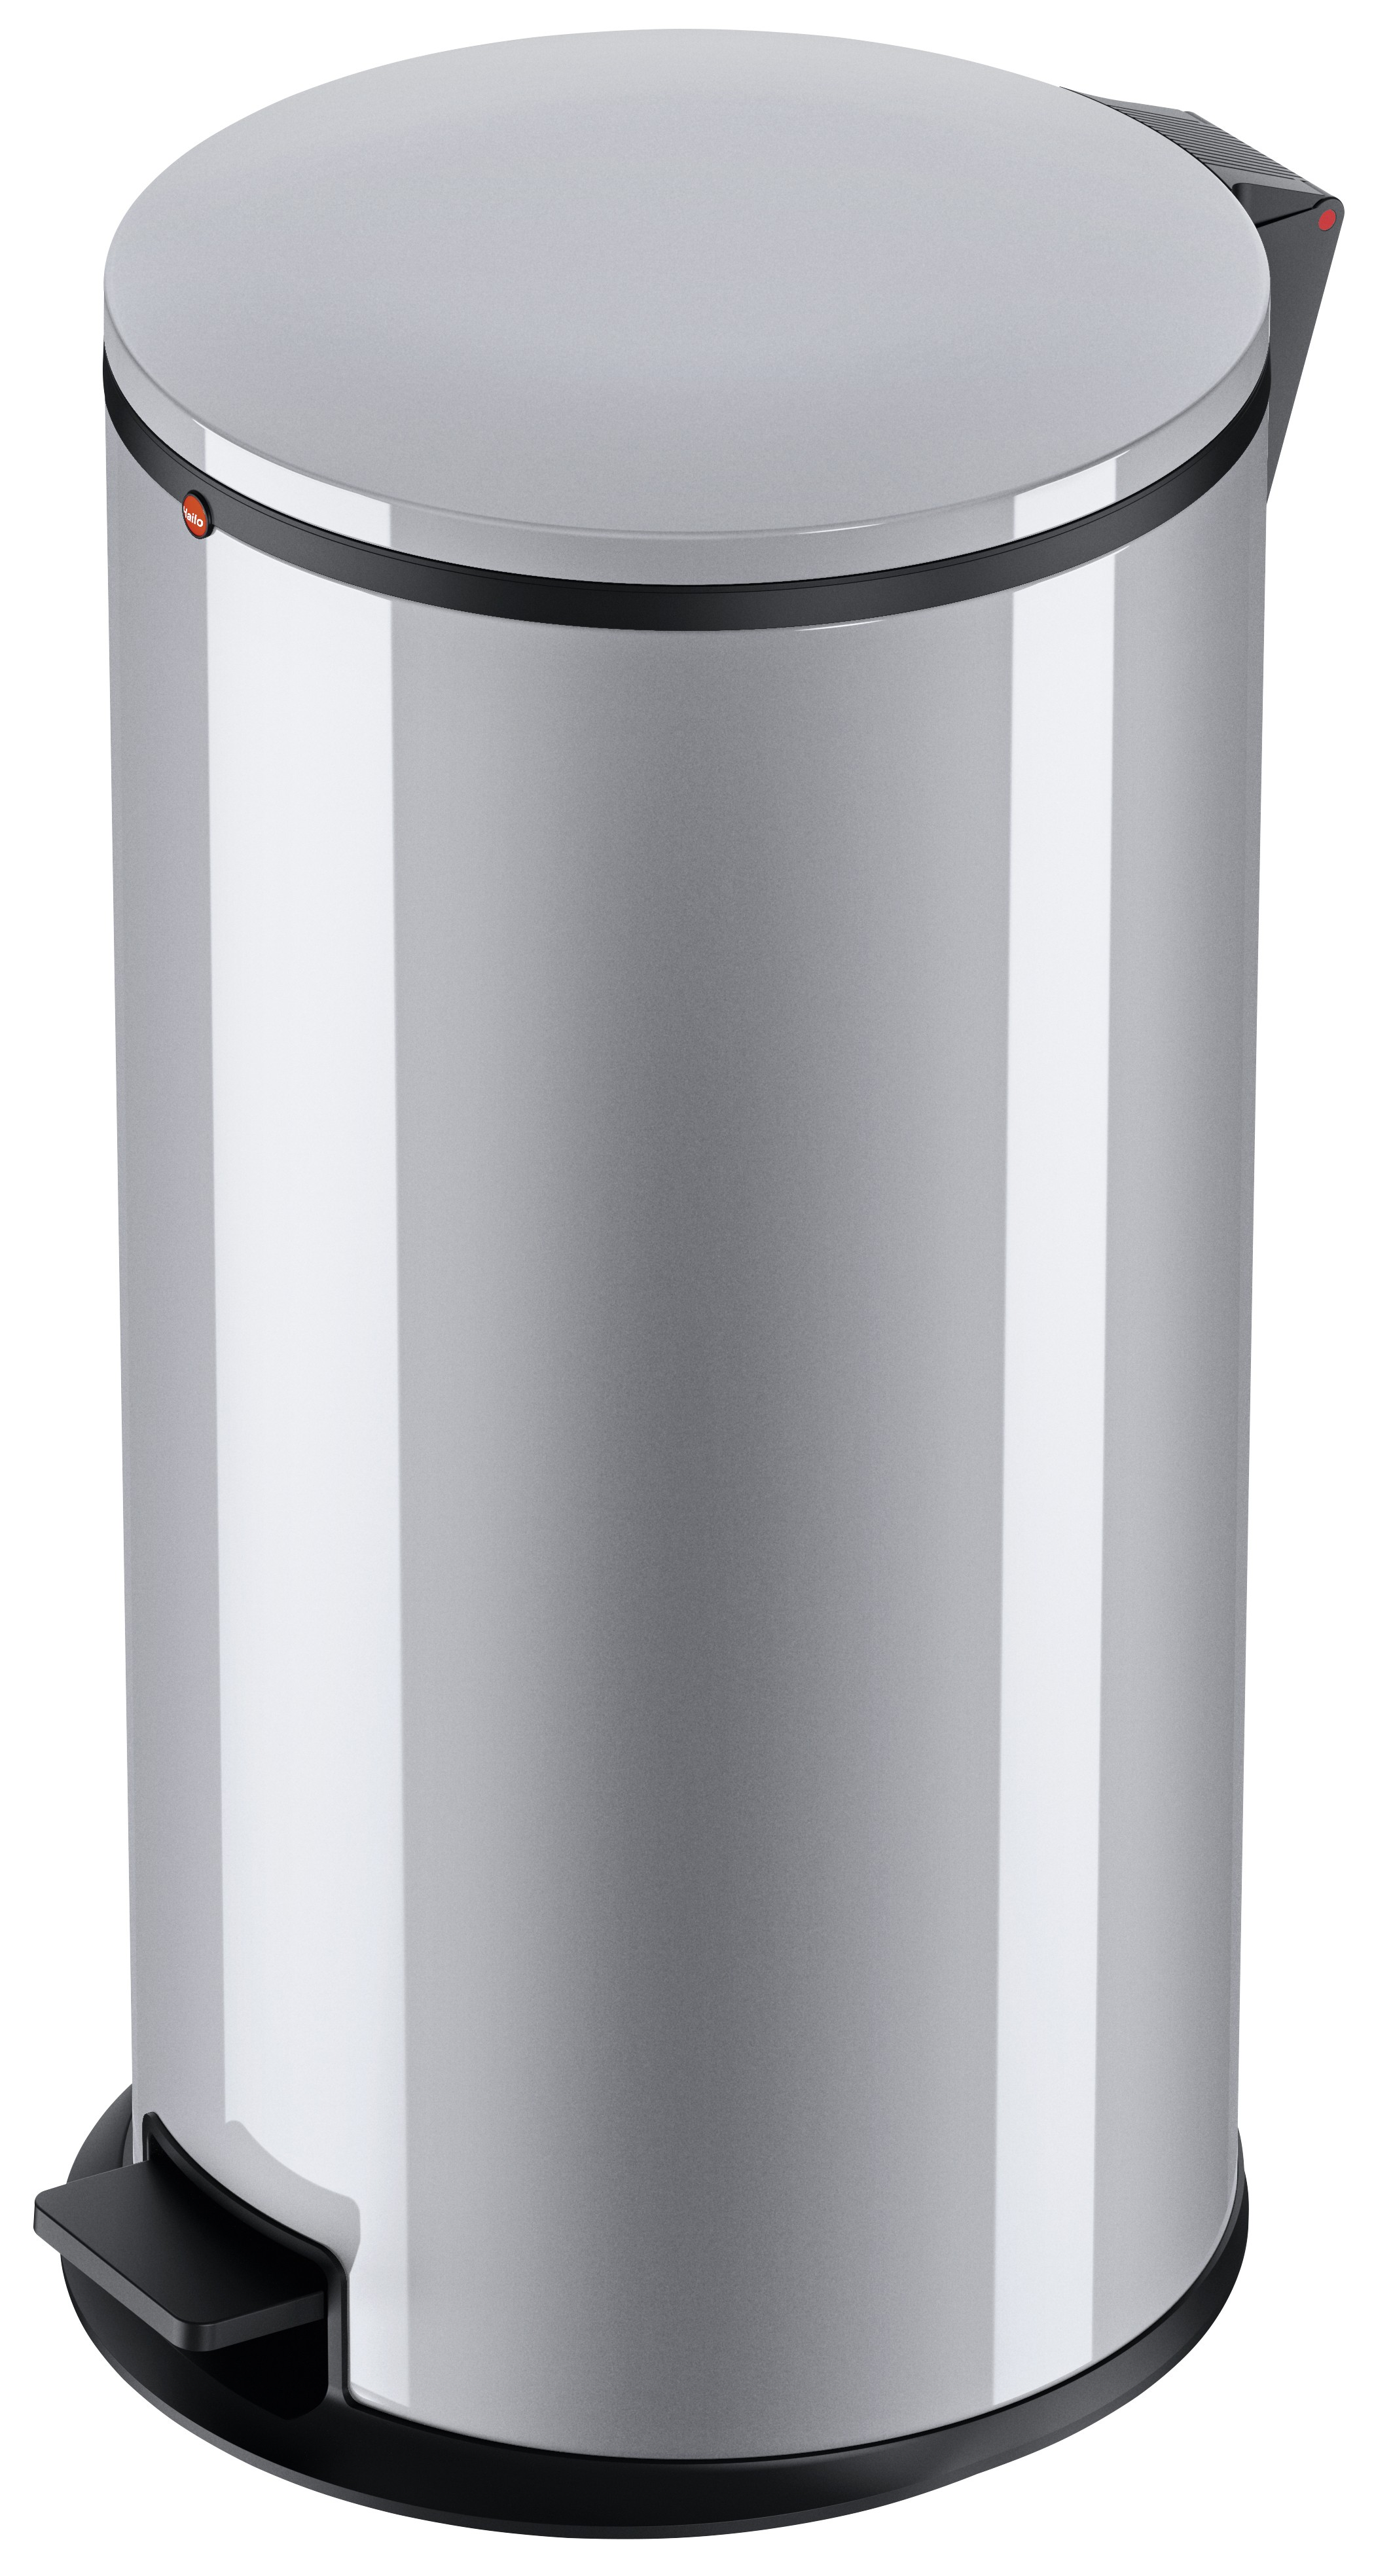 Hailo Pure XL, Stahlblech silber, 44 Liter, Inneneimer: verzinkt, Tret-Abfallsammler